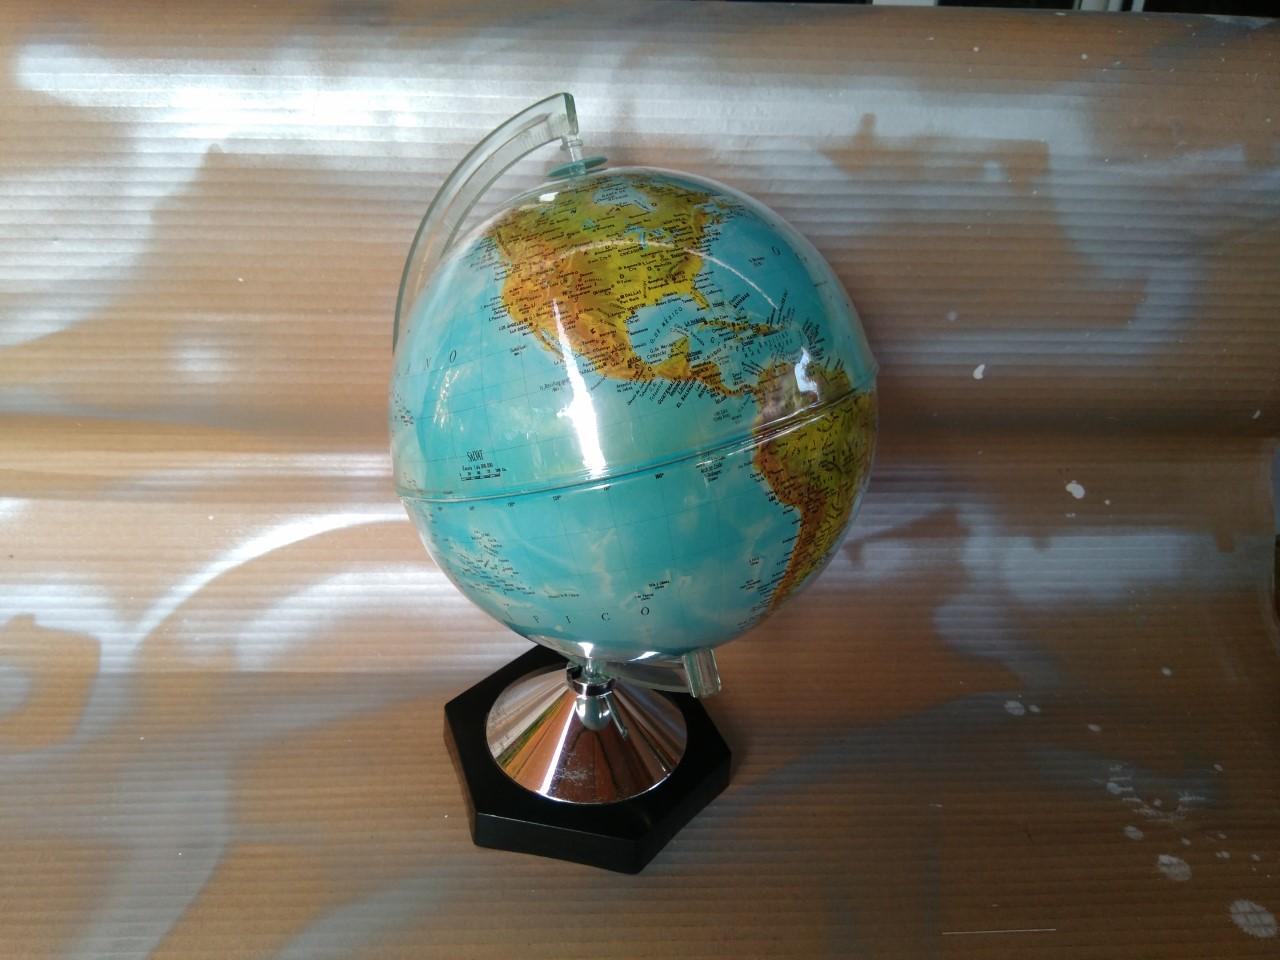 Manualidades plus bola del mundo decorada - Bola del mundo decoracion ...